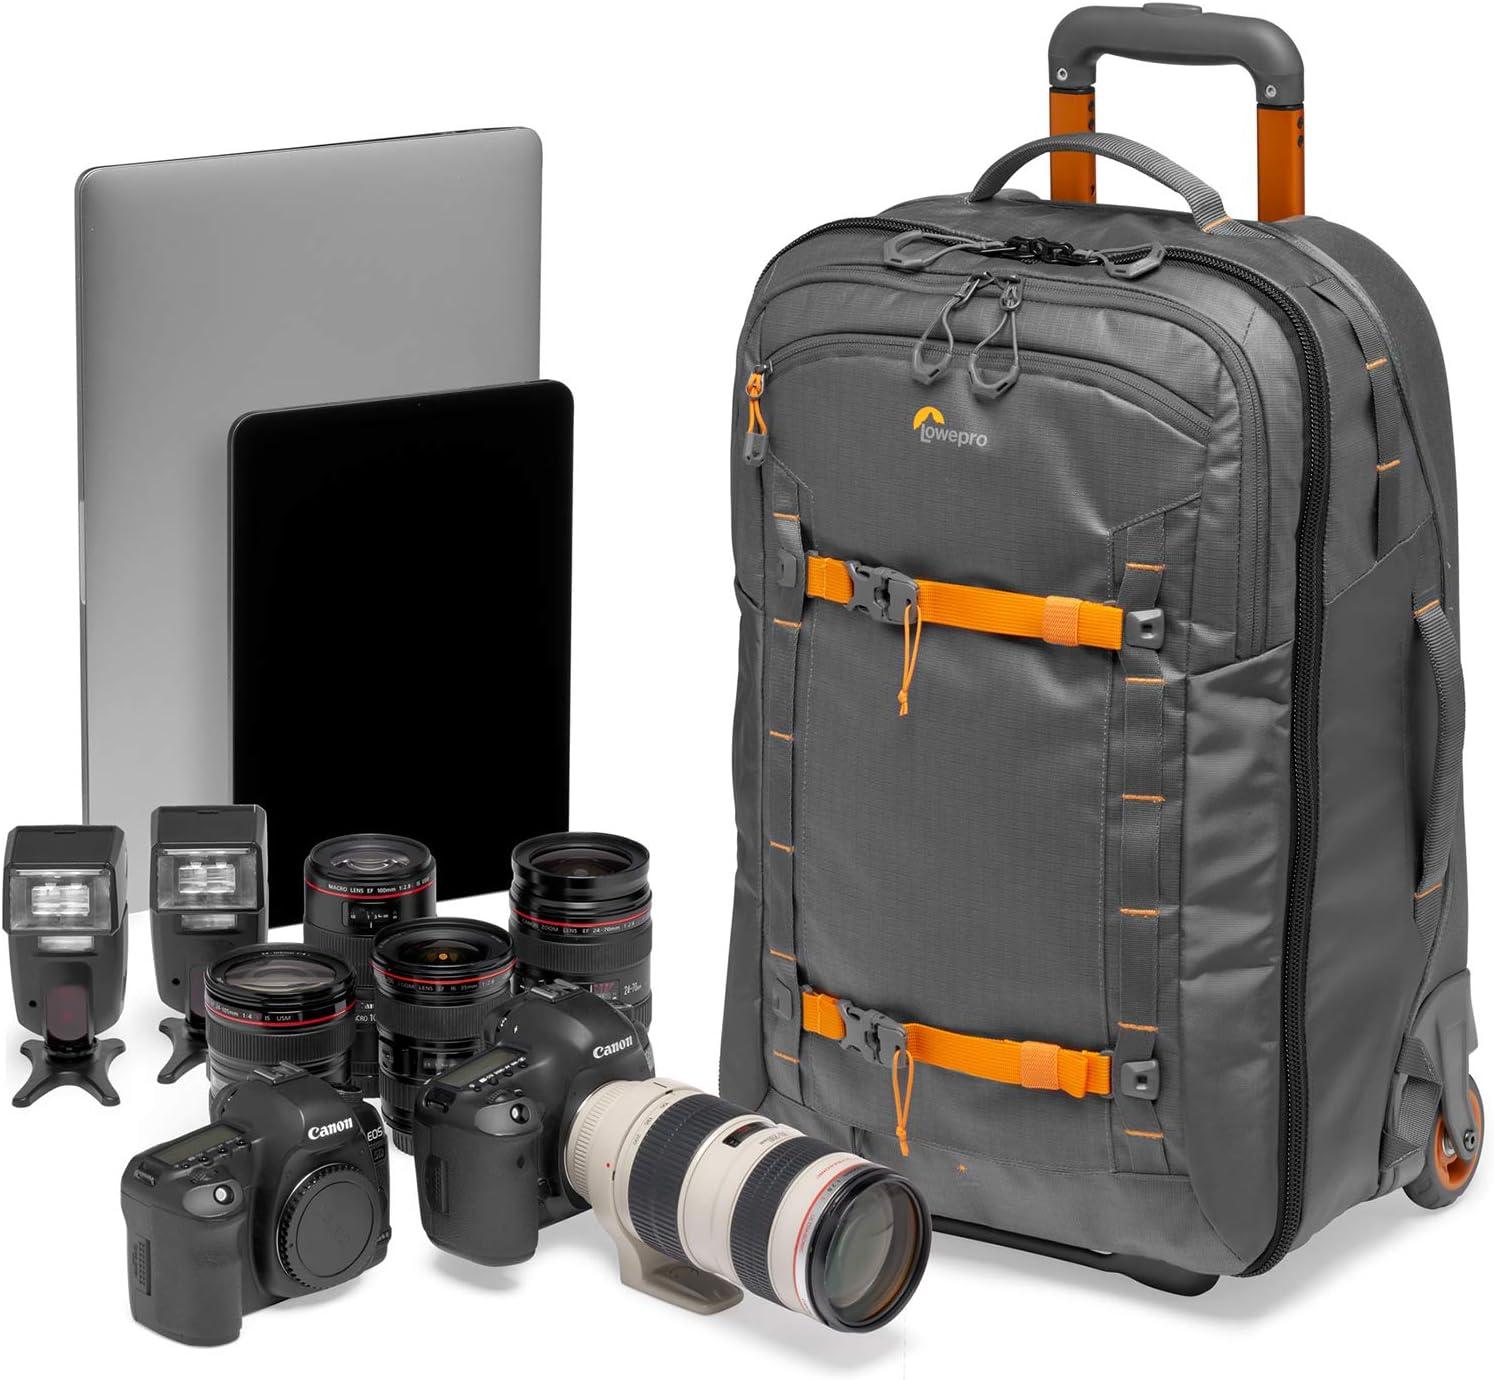 Lowepro Lp37280 Pww Kompaktkamera Taschengrau Kamera